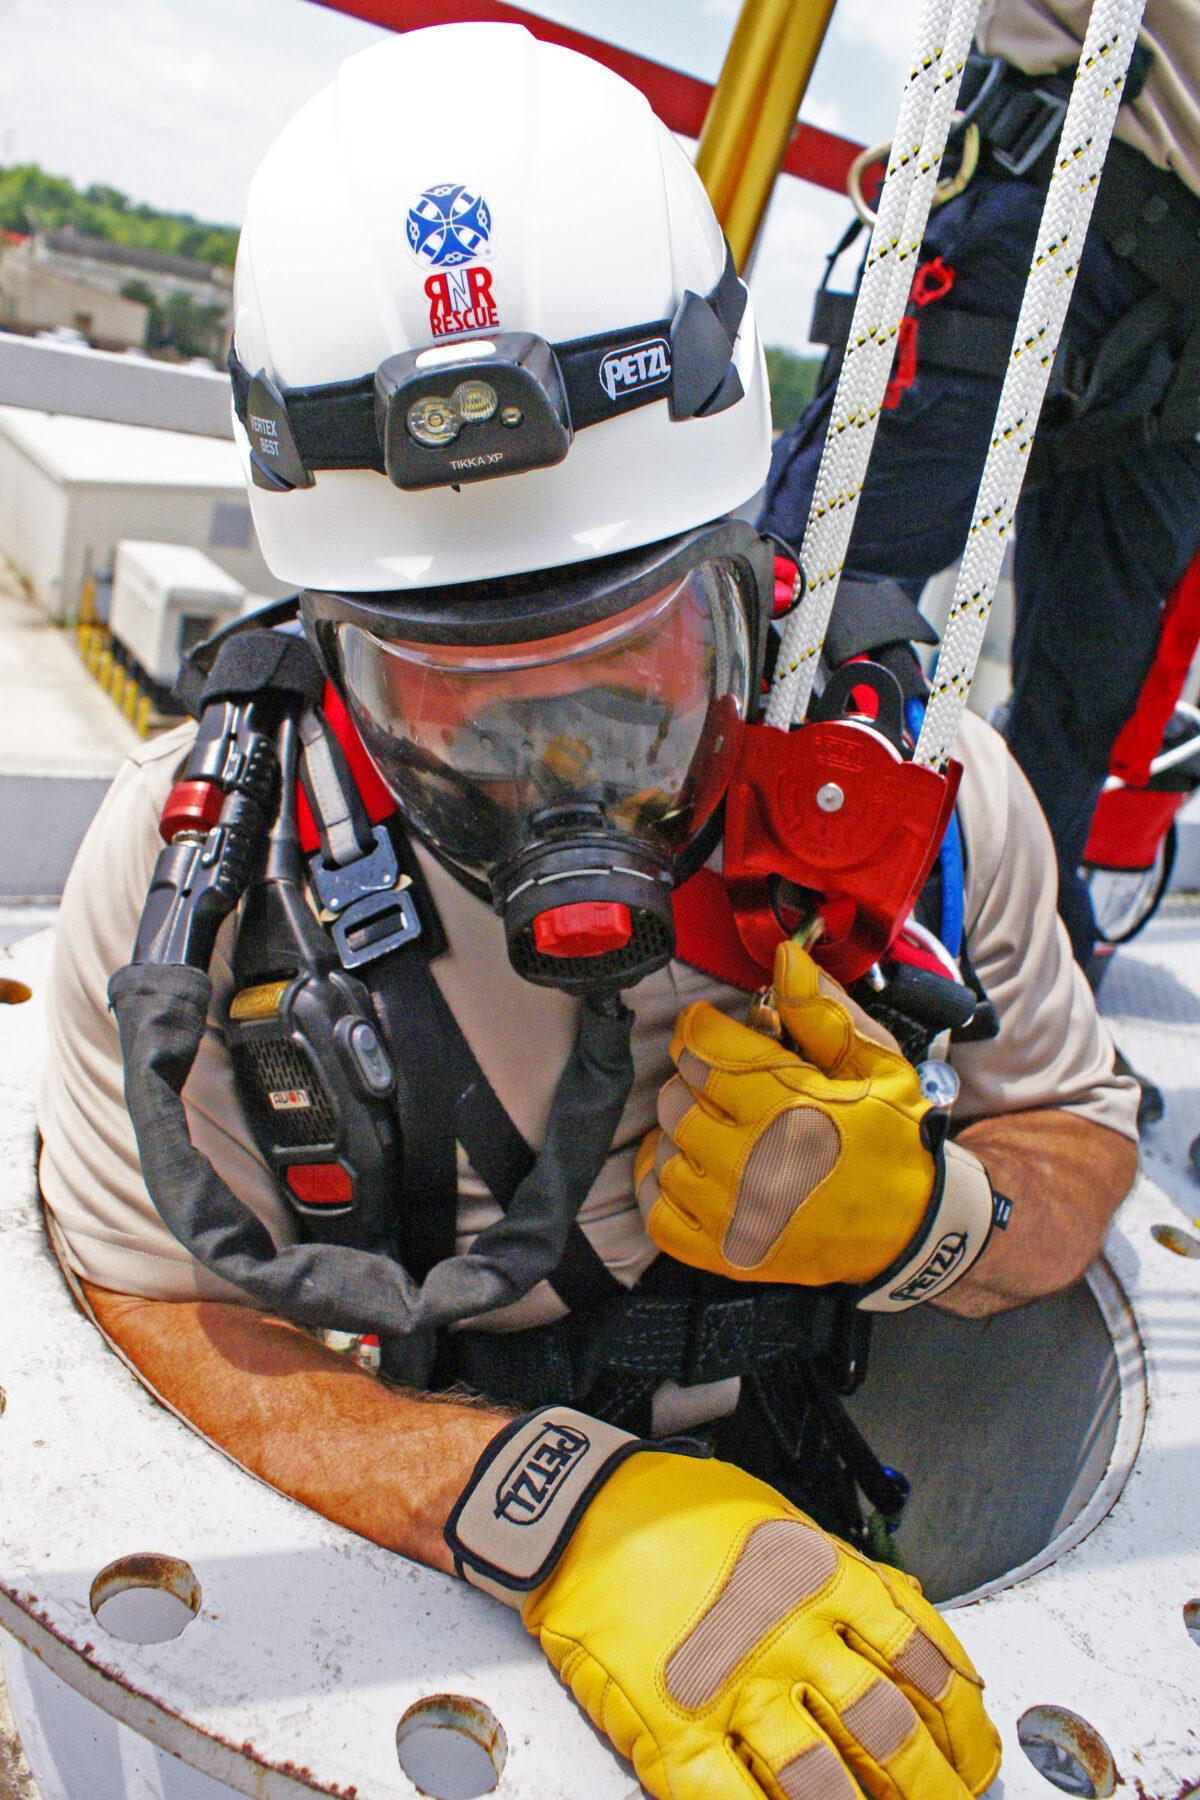 Petzl Technical Partner - RNR Rescue - engineer